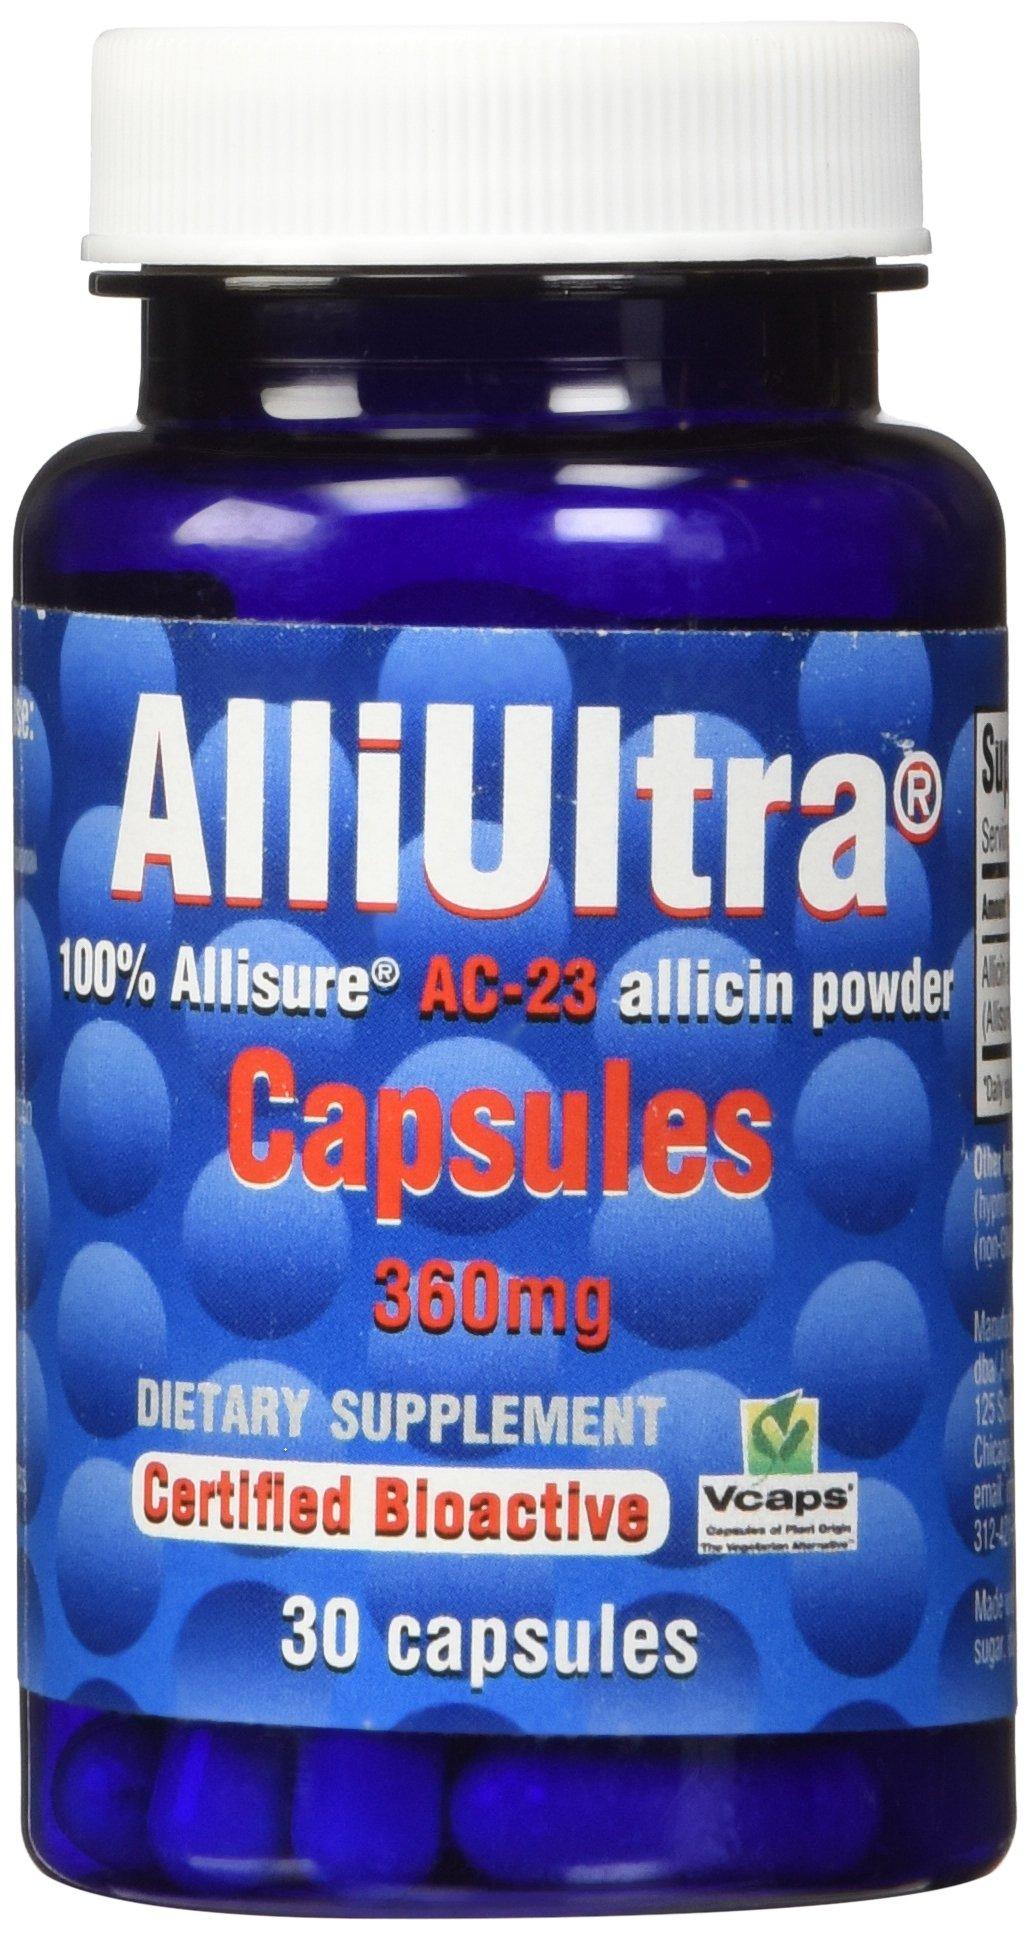 Allimax - Alliultra AC-23 Allicin Capsules, 360 mg, 30 Vcaps Capsules